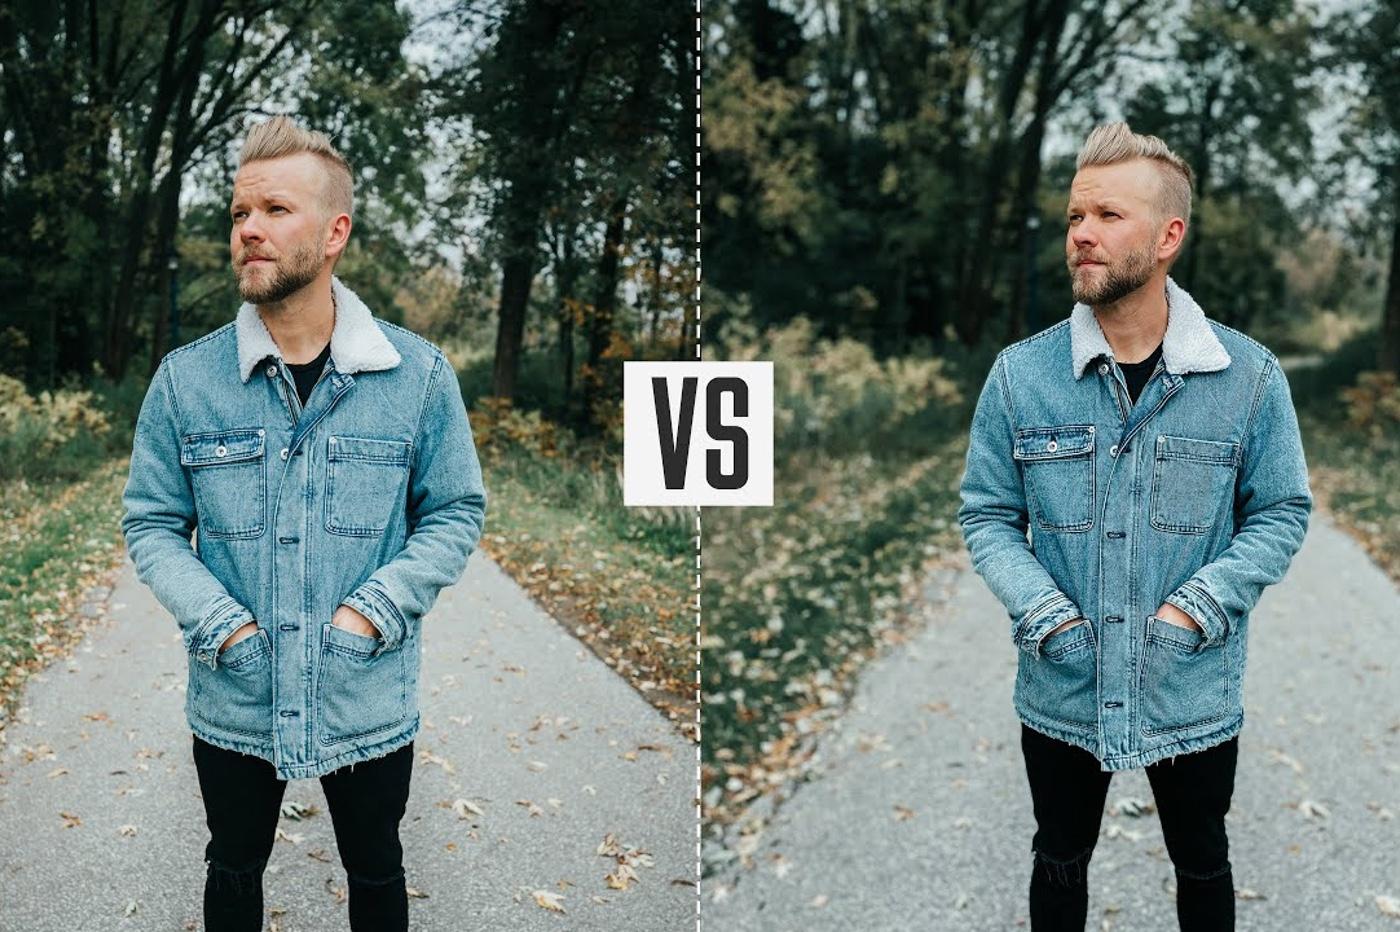 comparaison iPhone 11 Pro vs appareil photo canon